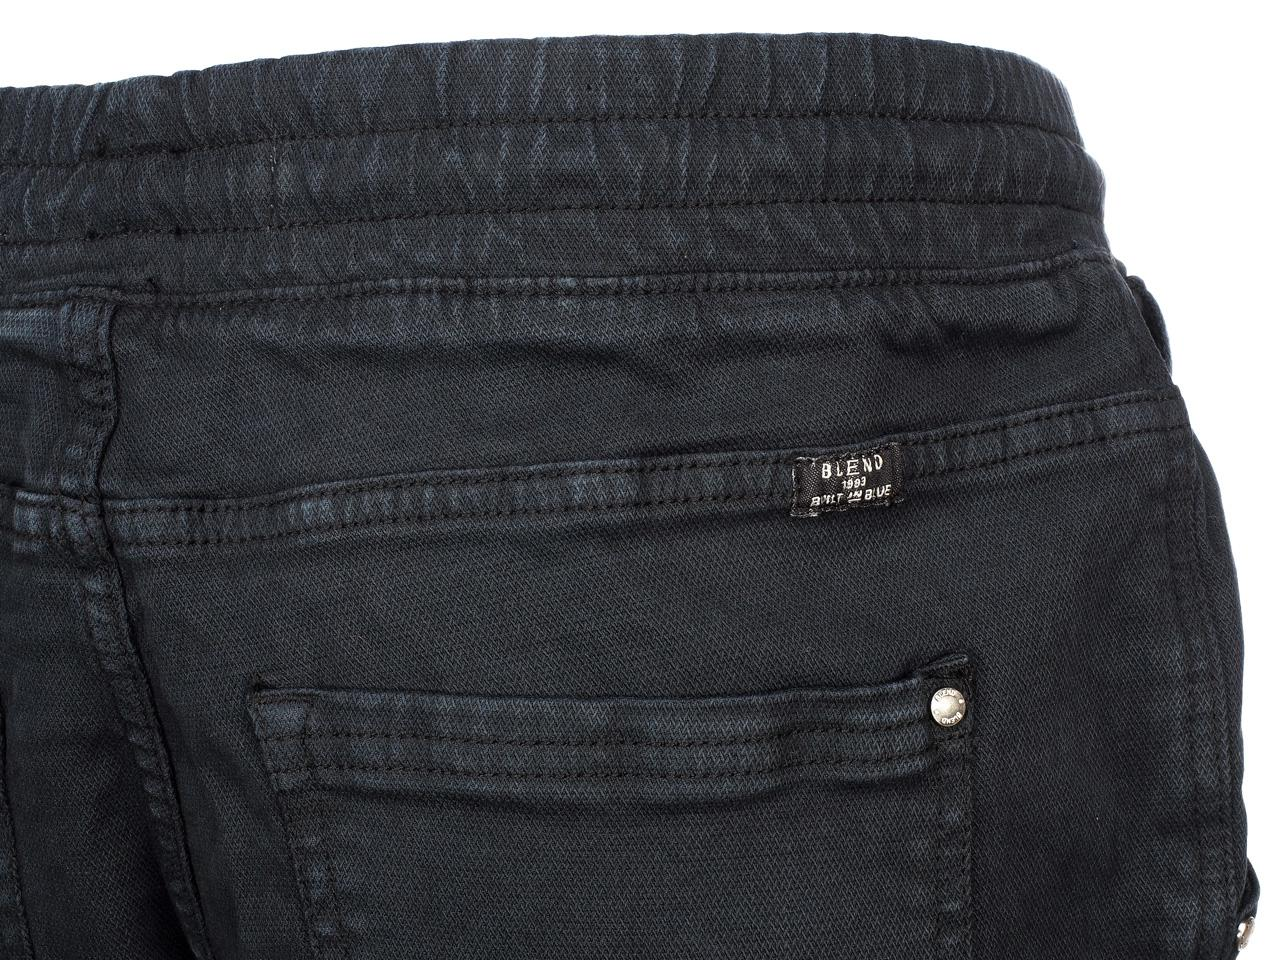 Pantalon-jeans-Blend-Jogg-jeans-34-denim-black-Noir-59114-Neuf miniature 4